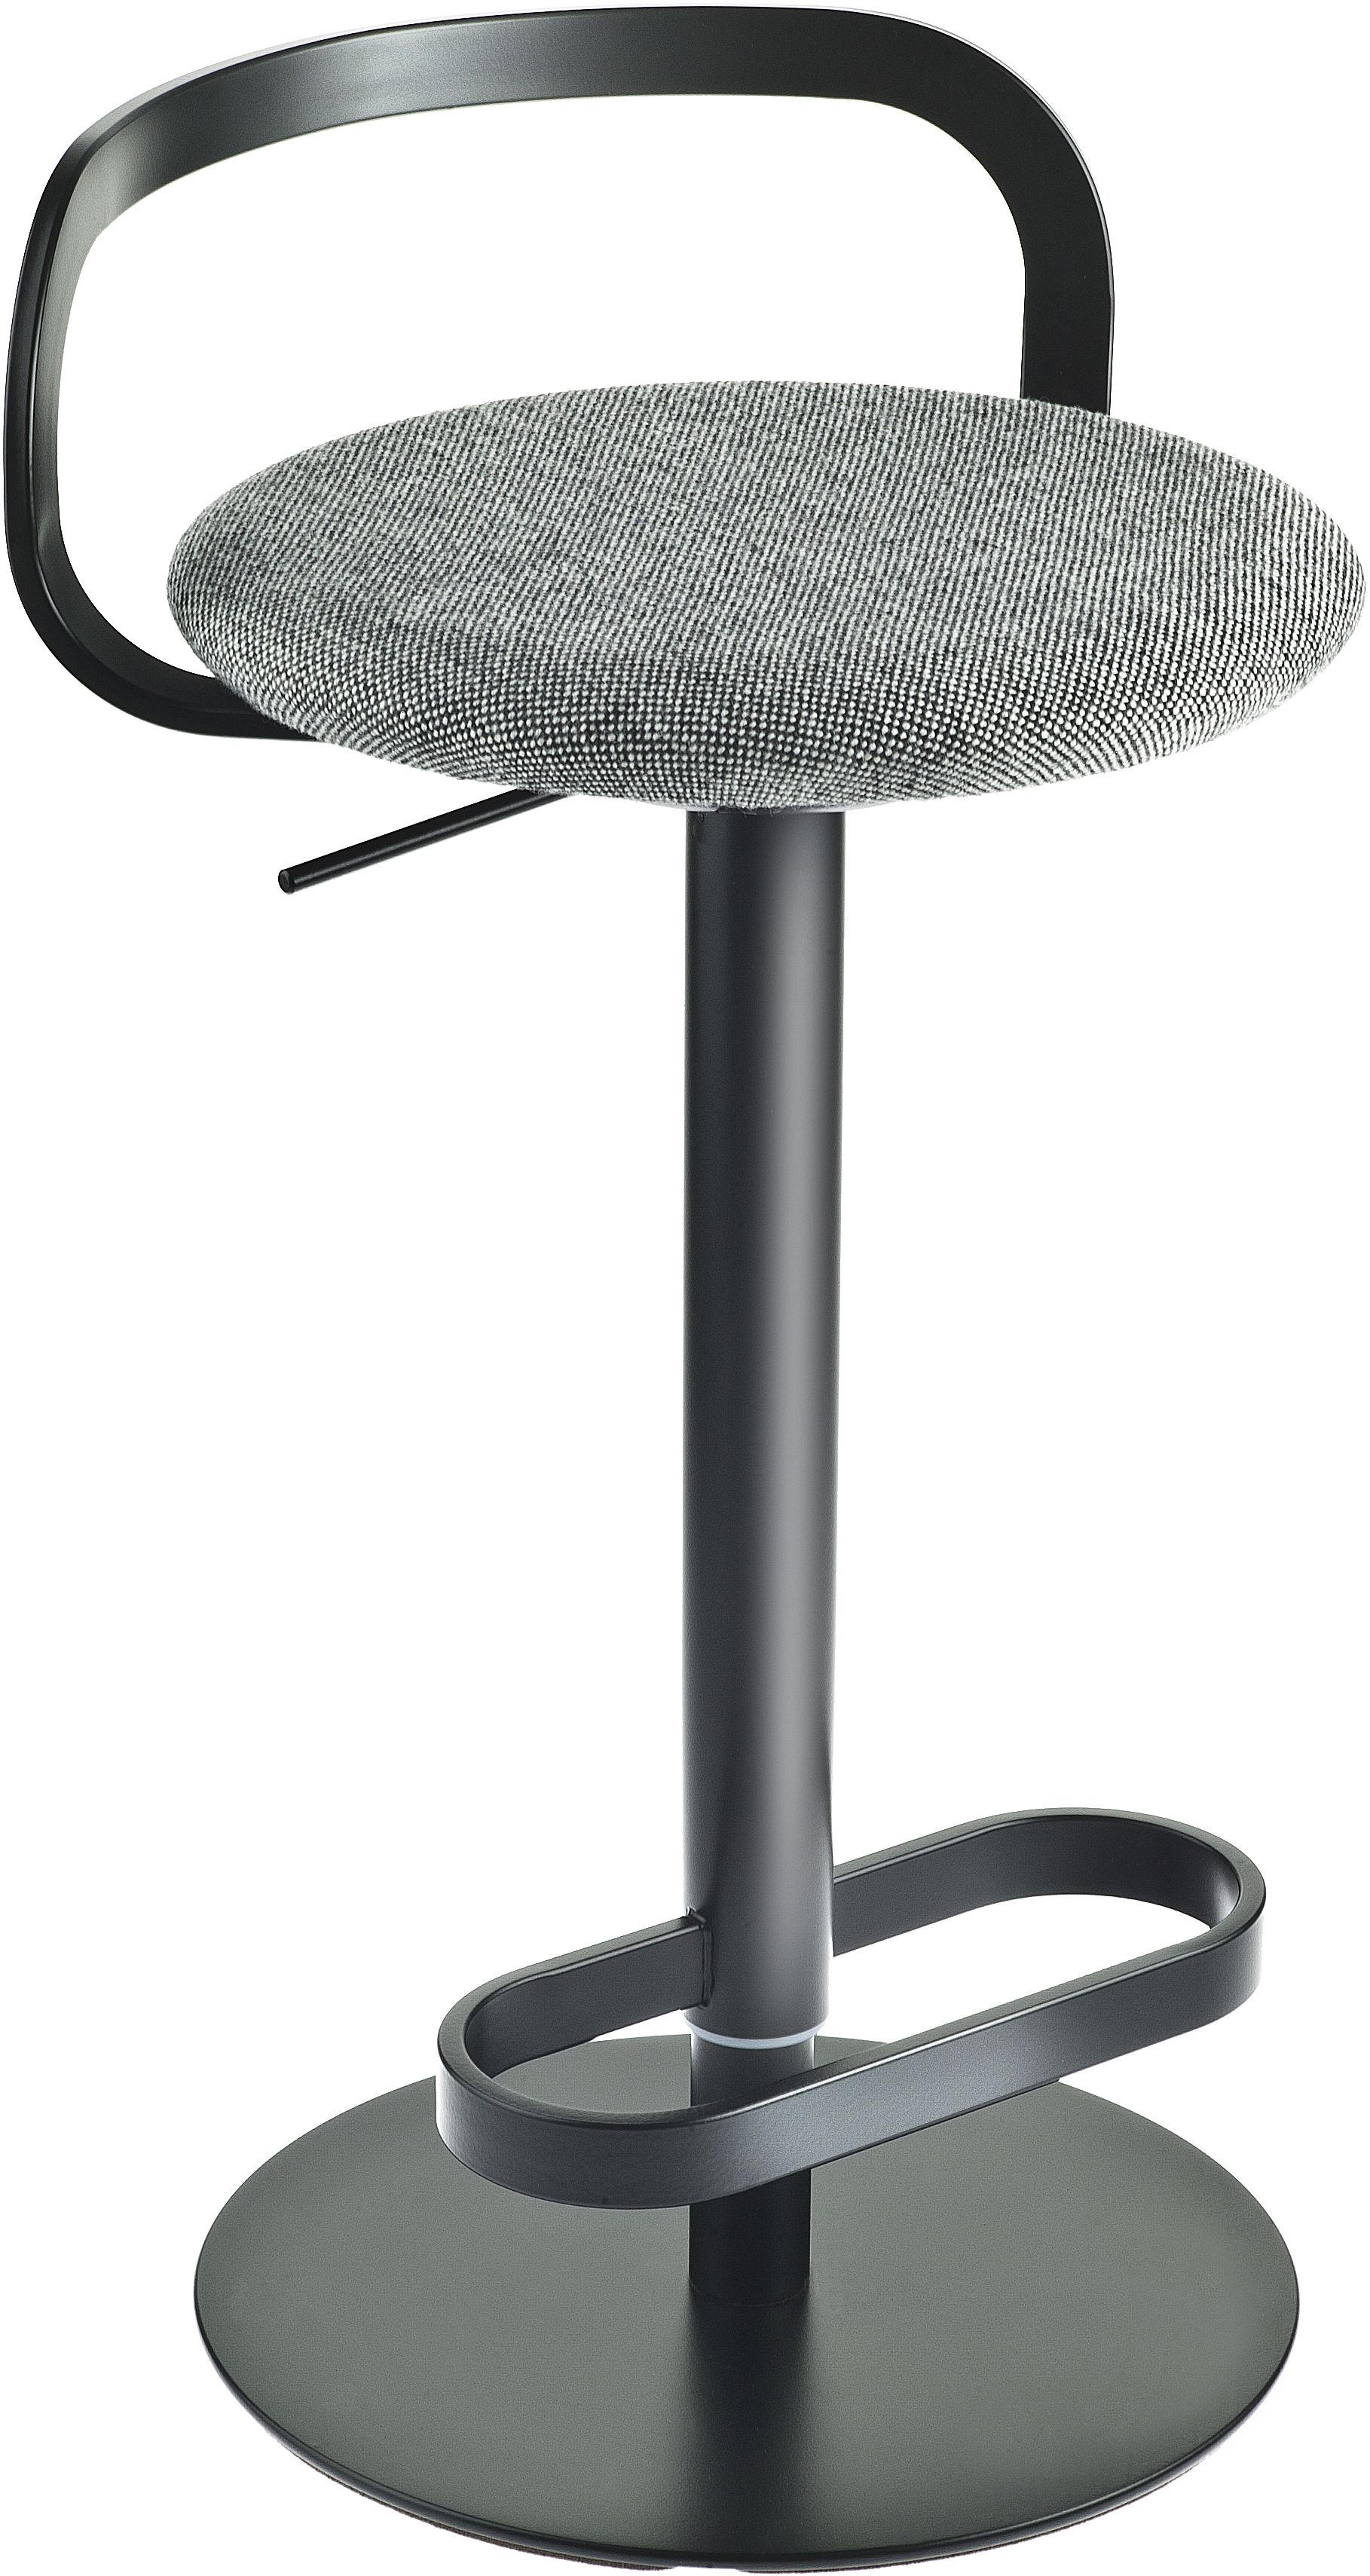 tabouret haut r glable mak pivotant assise rembourr e tissu assise tissu gris structure. Black Bedroom Furniture Sets. Home Design Ideas